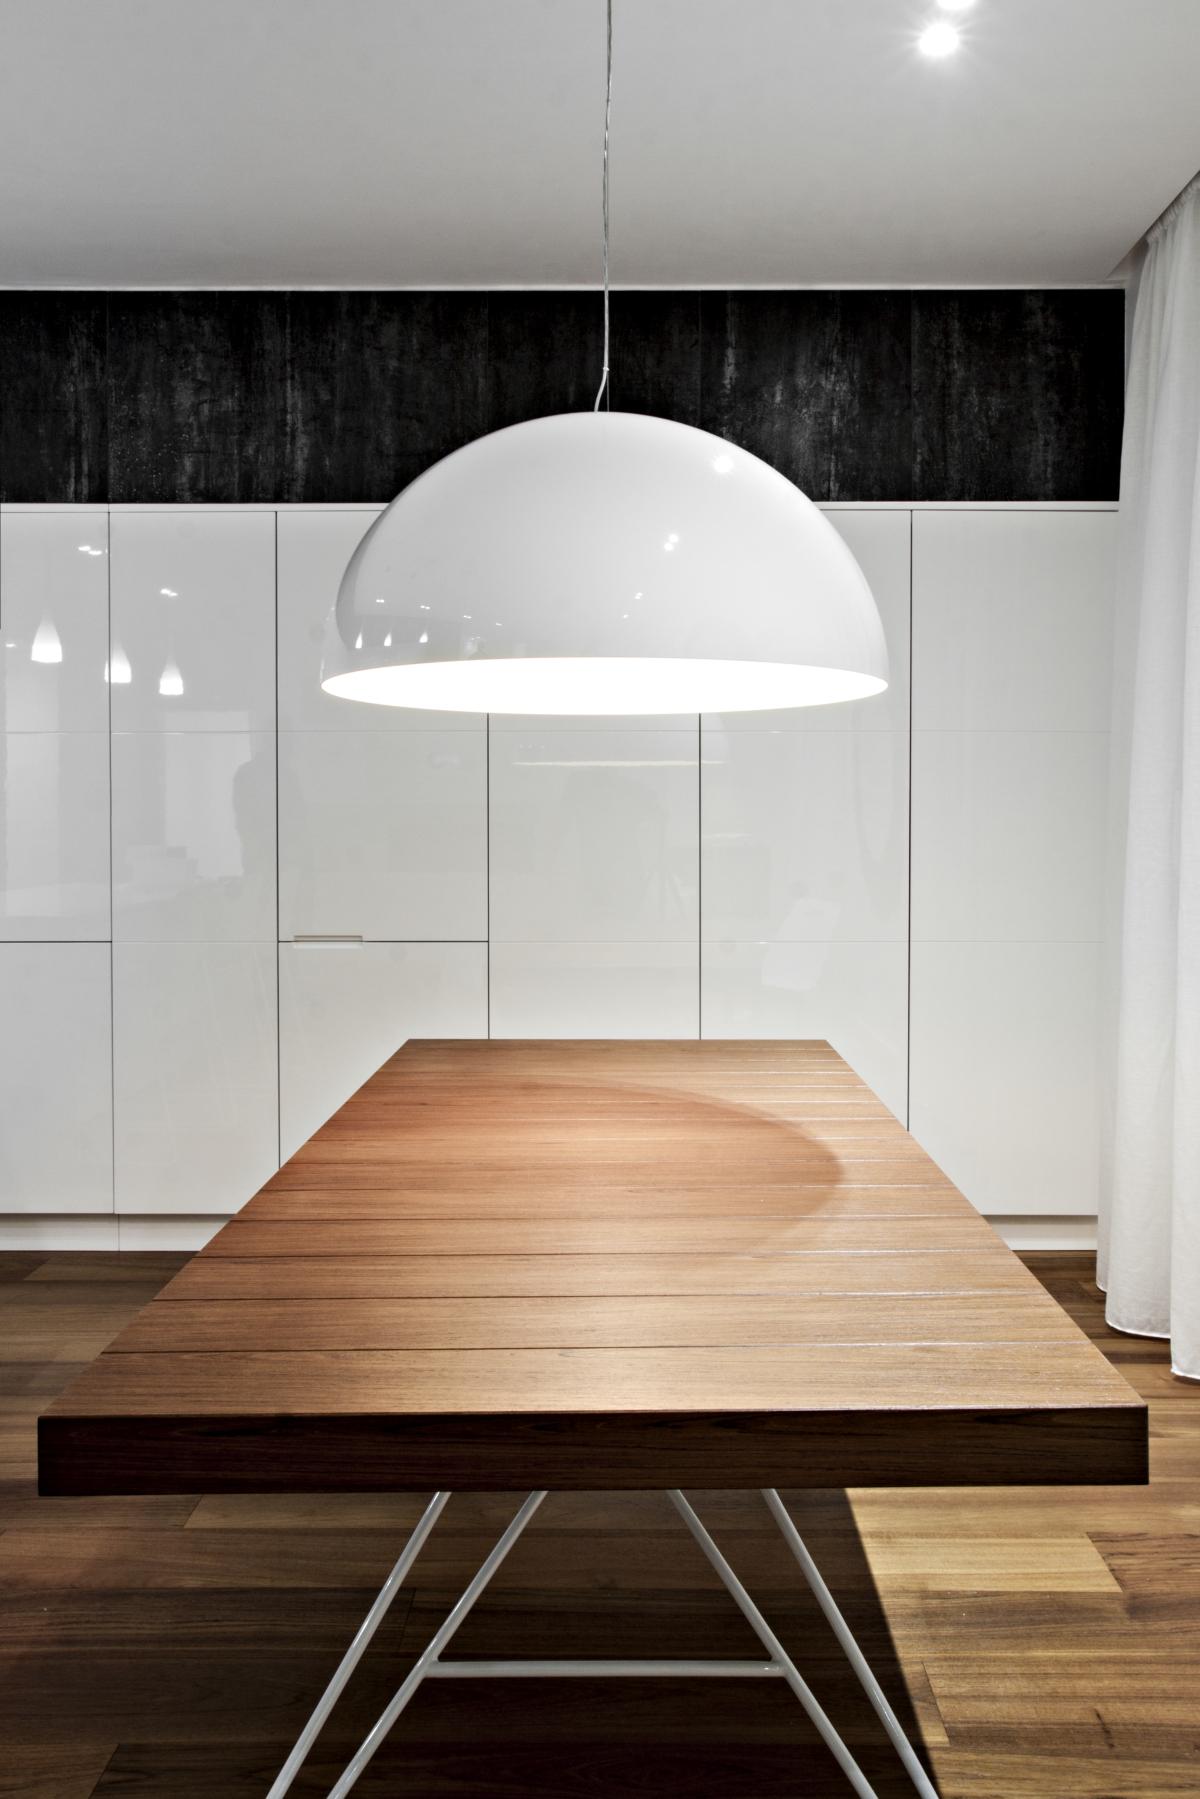 sg-Haus-michelangelo-Olivieri-for-m12ad-24